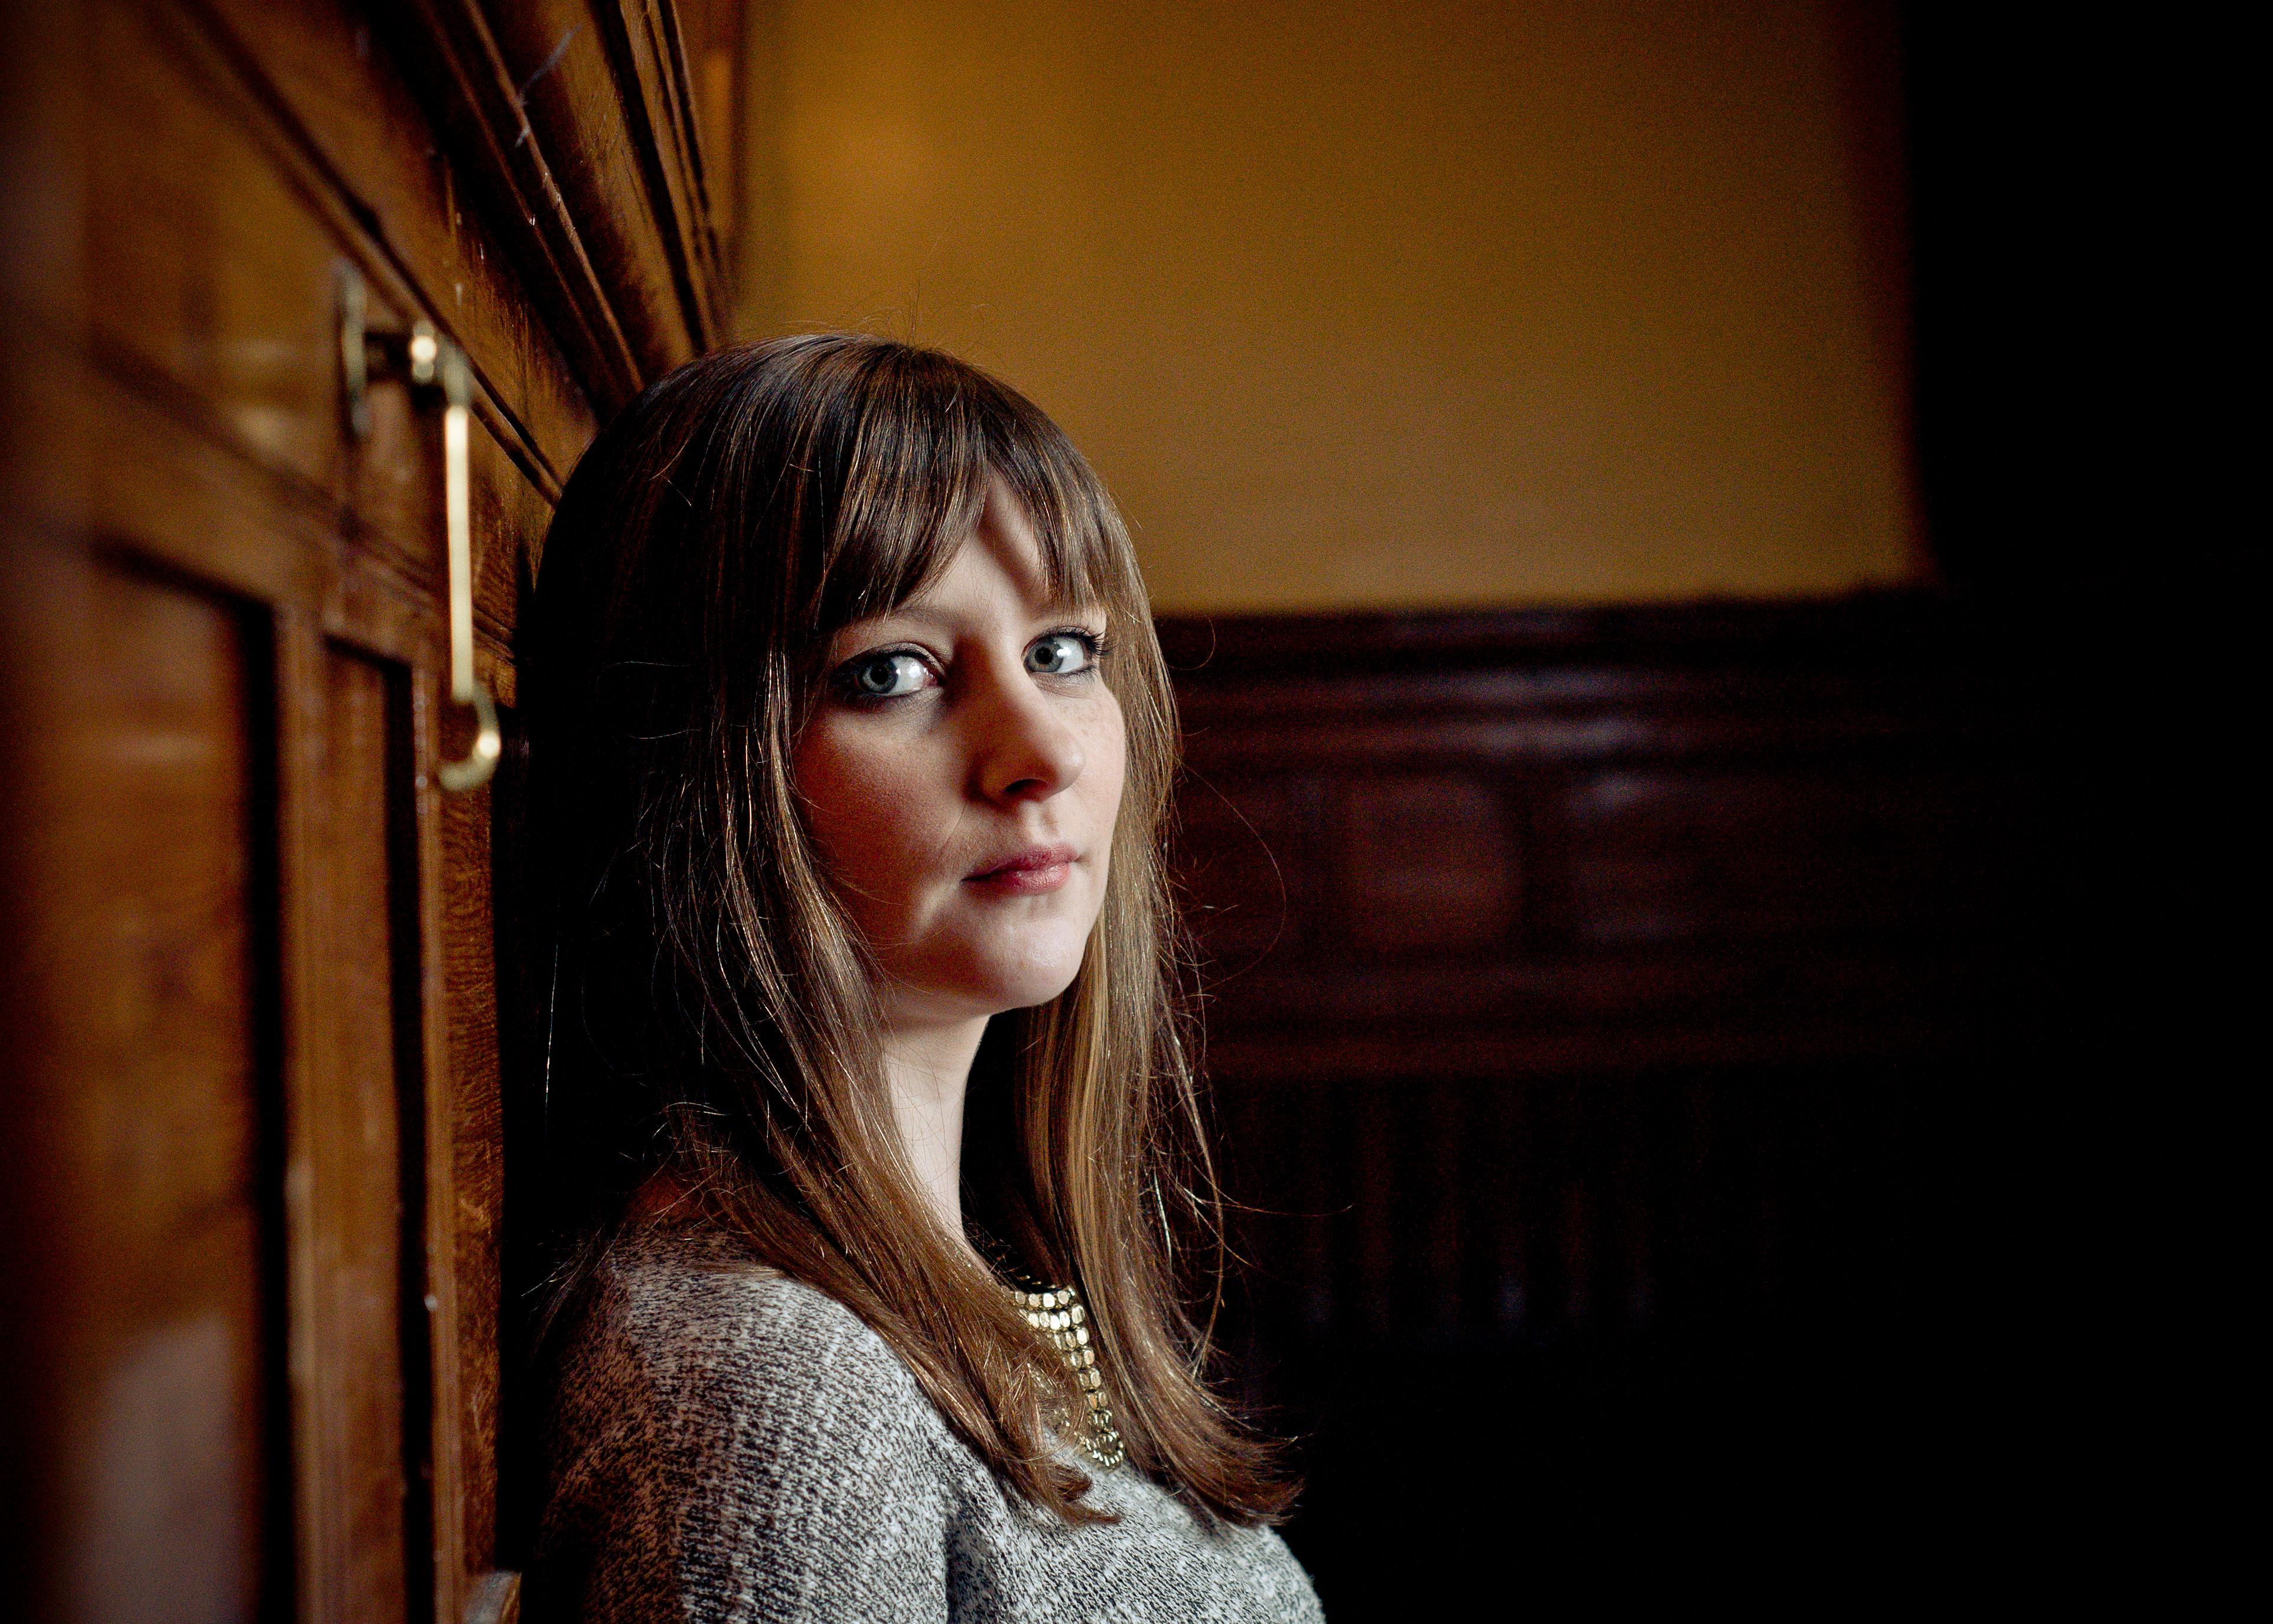 Sarah Hayes 2013 - Viewing Gallery